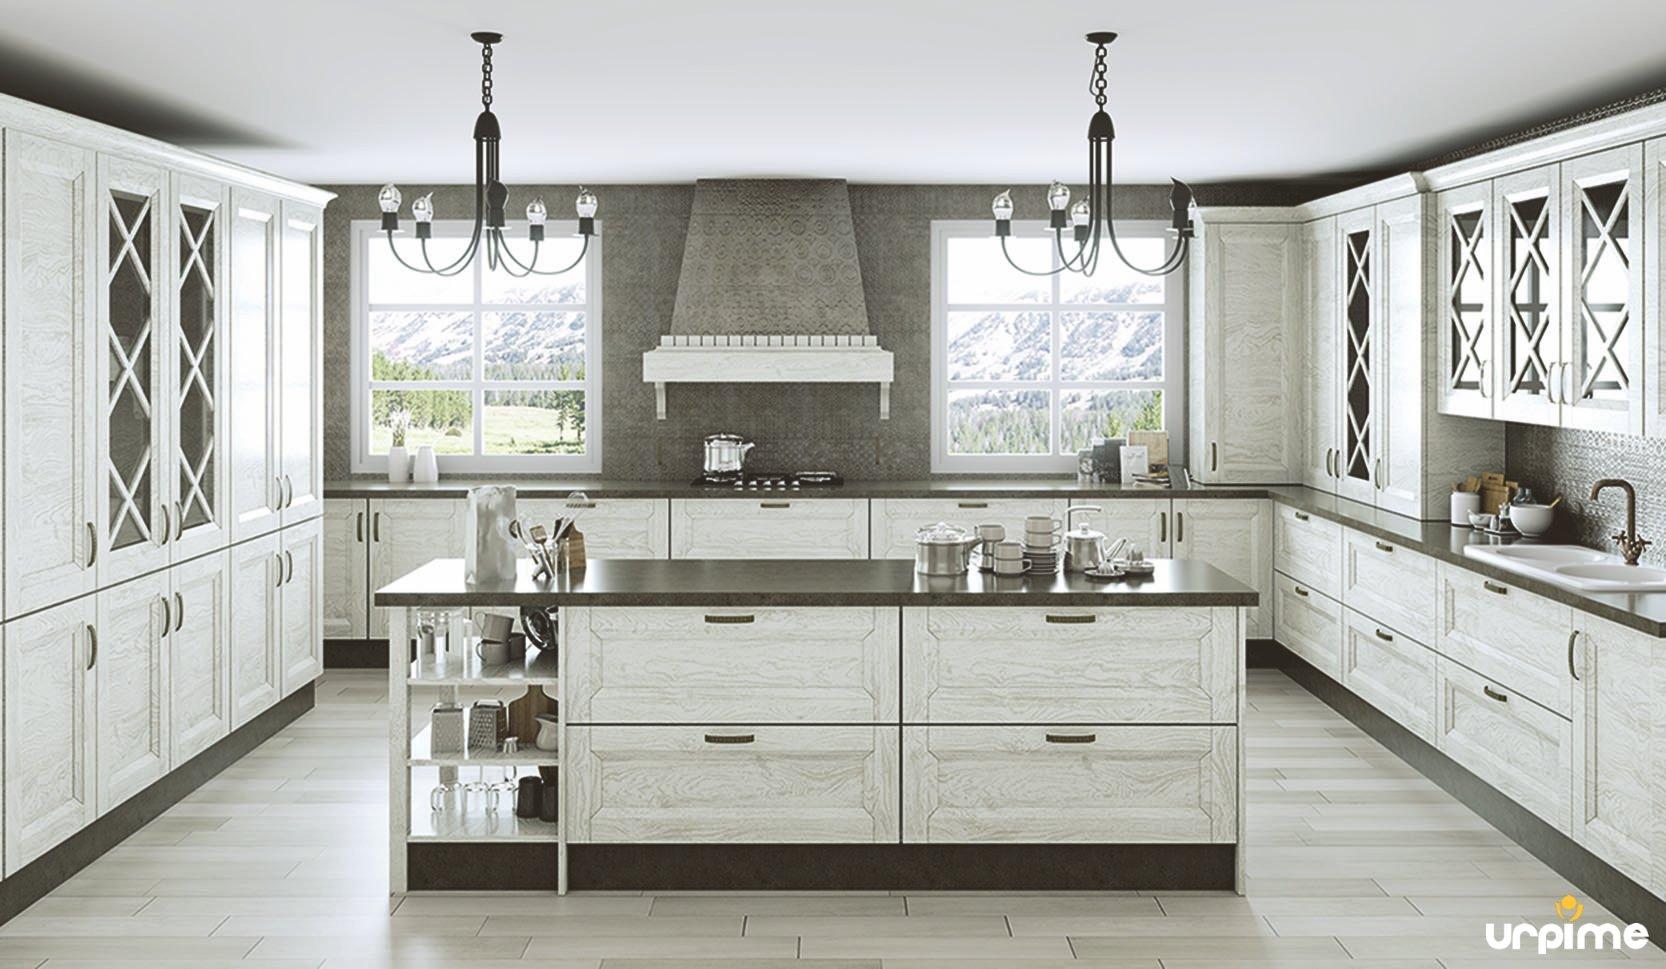 Ideas para amueblar la cocina – Urpime